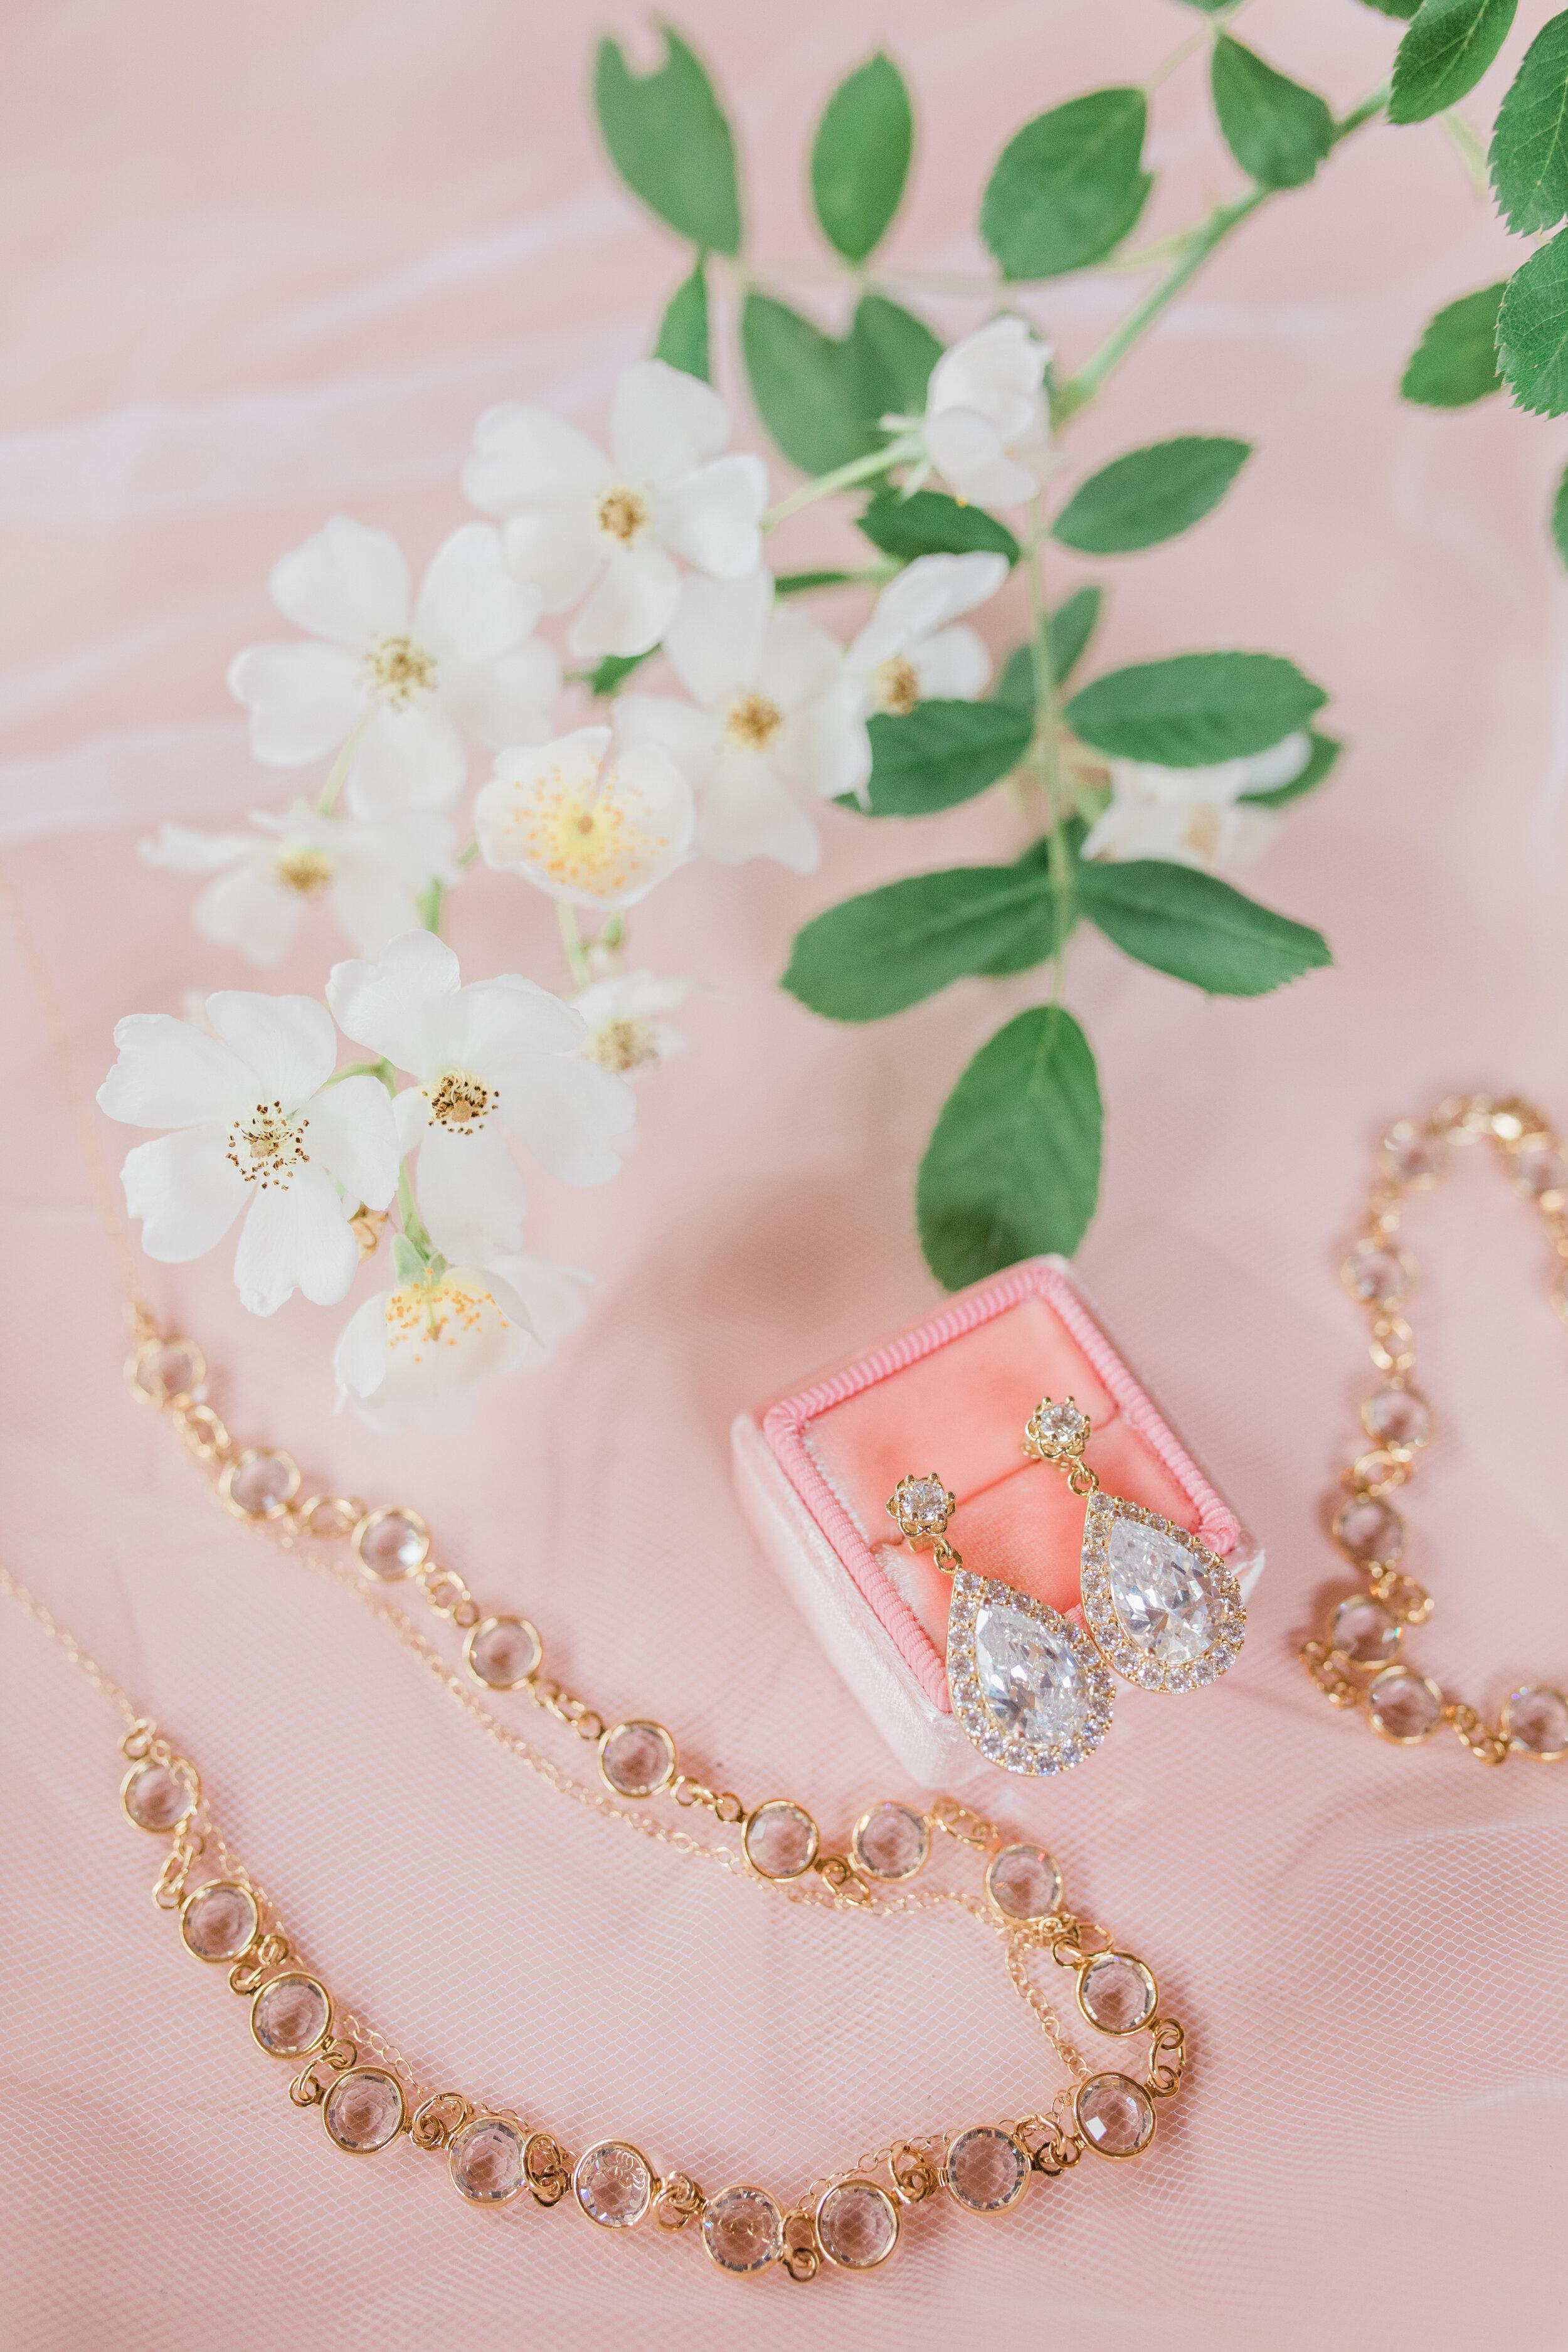 2018 Summer Wedding Inspo |  View Original Post